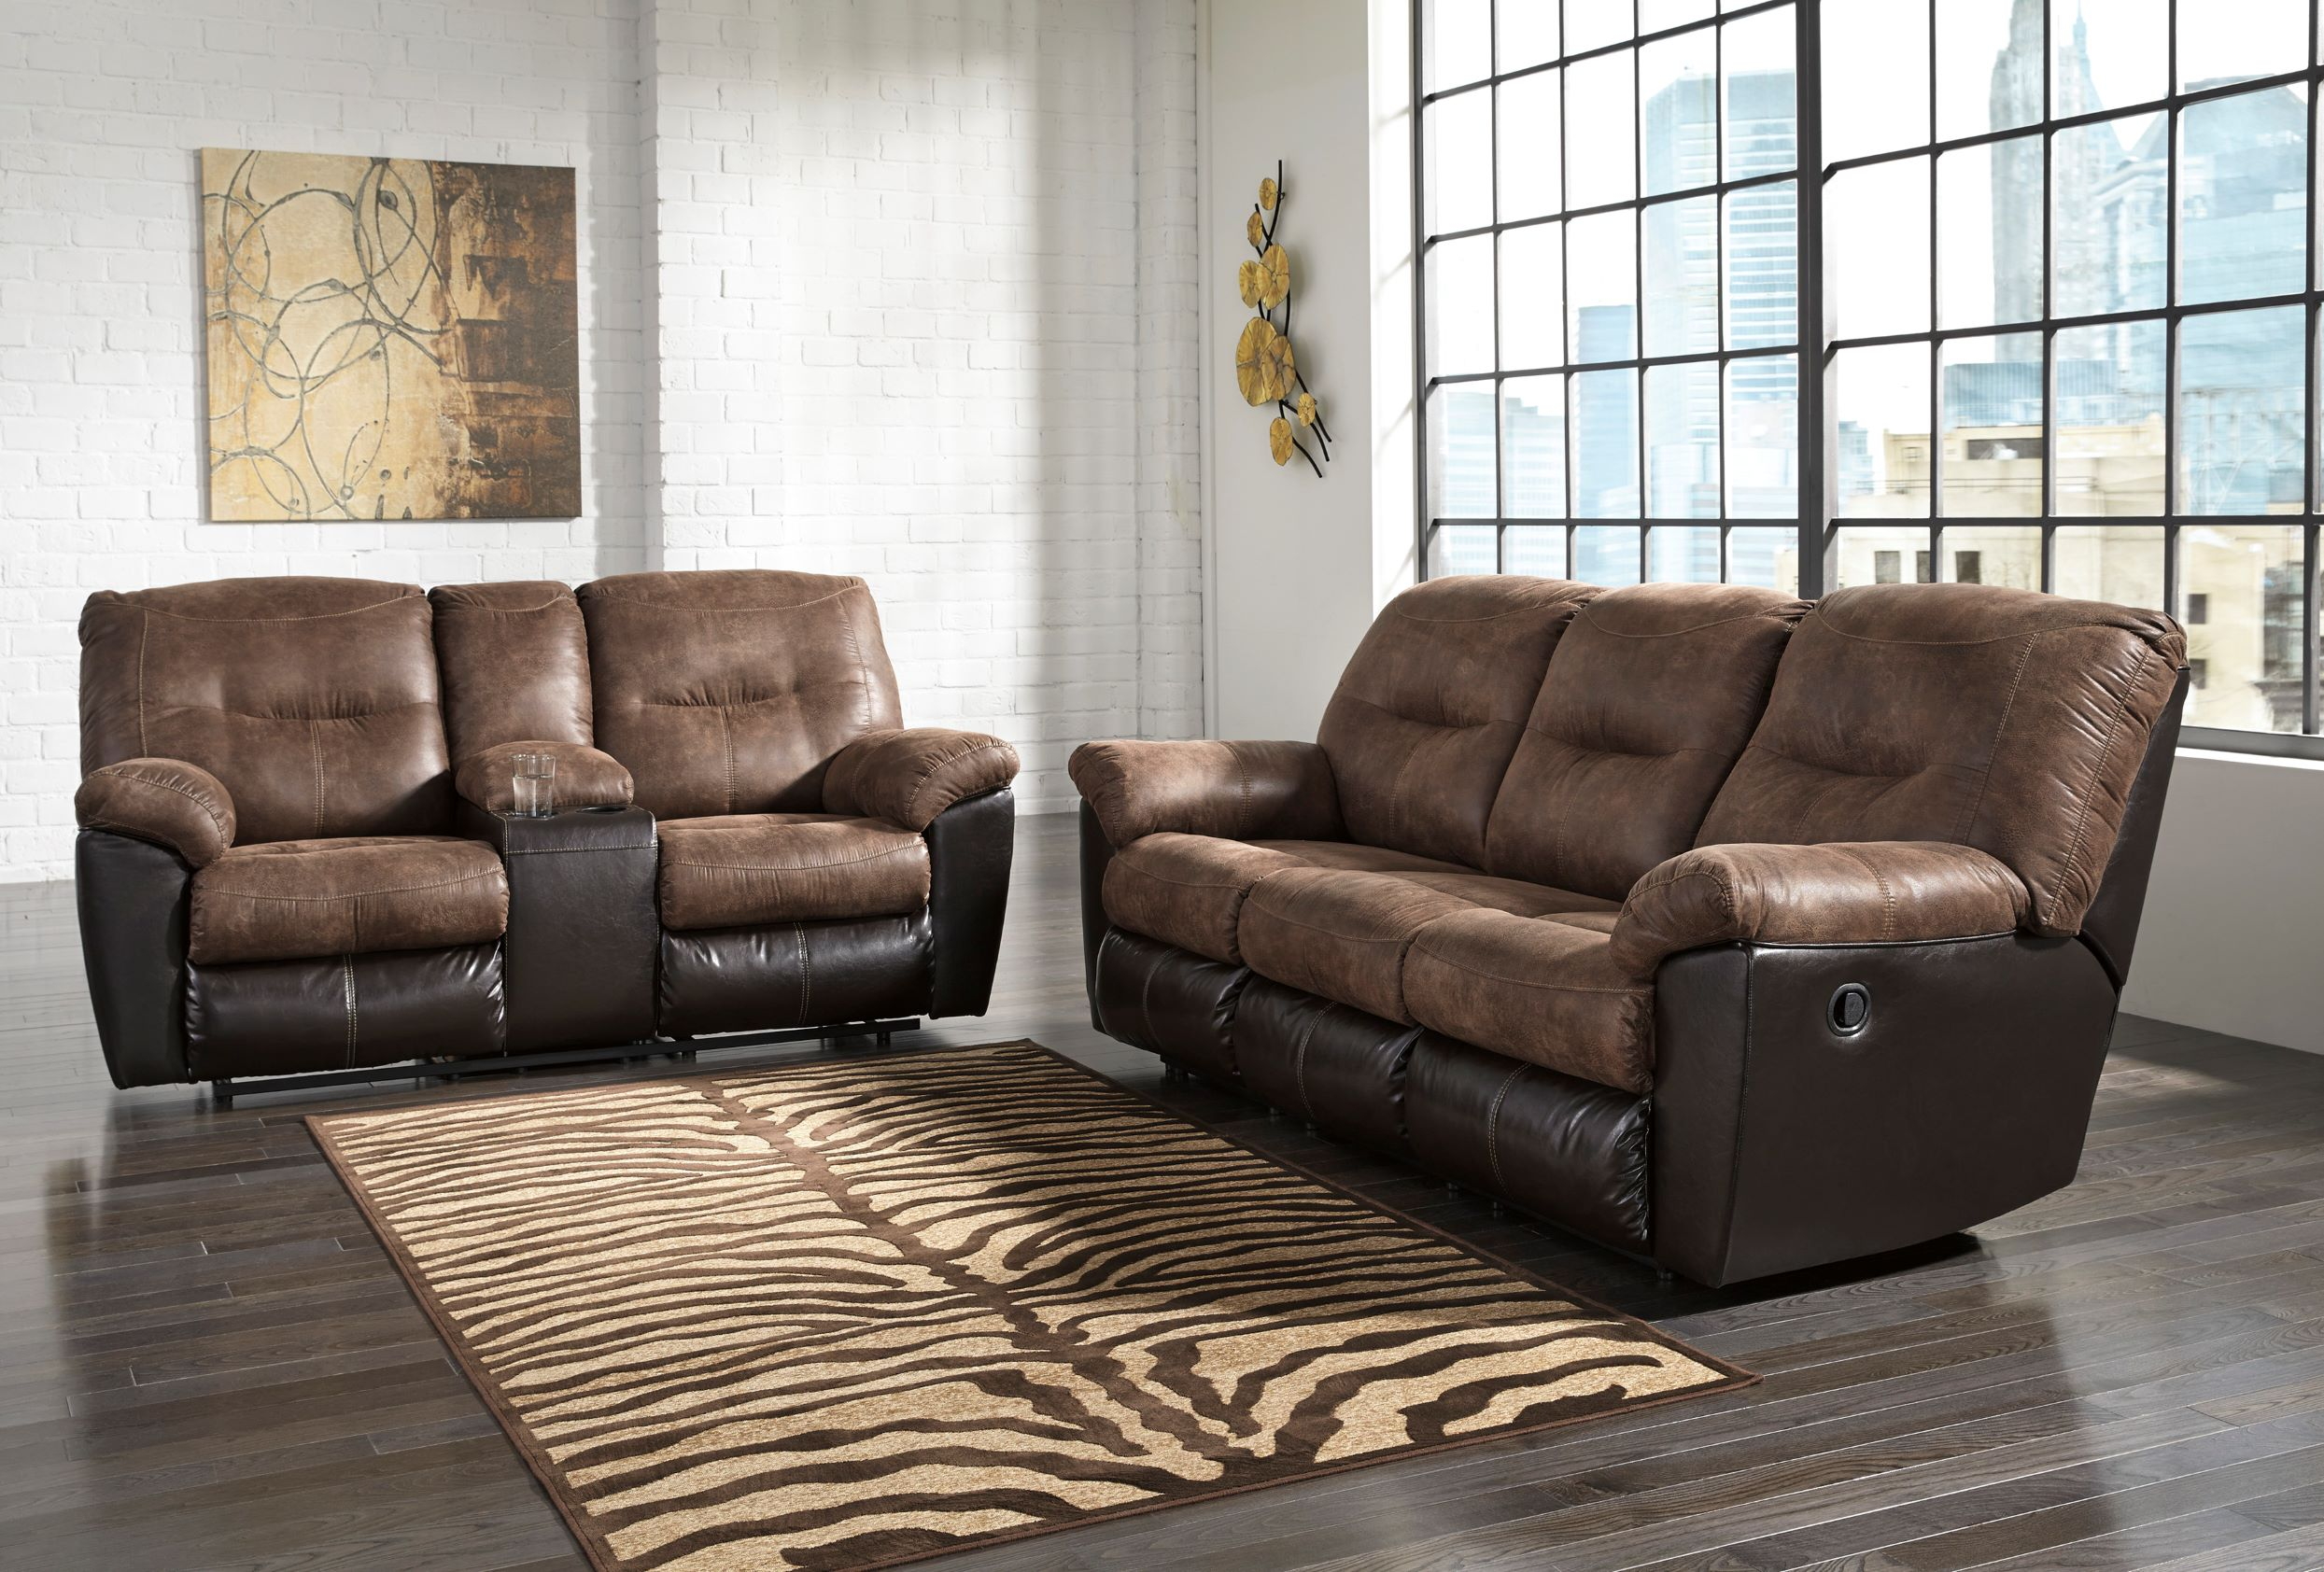 65202 REC Sofa and Love